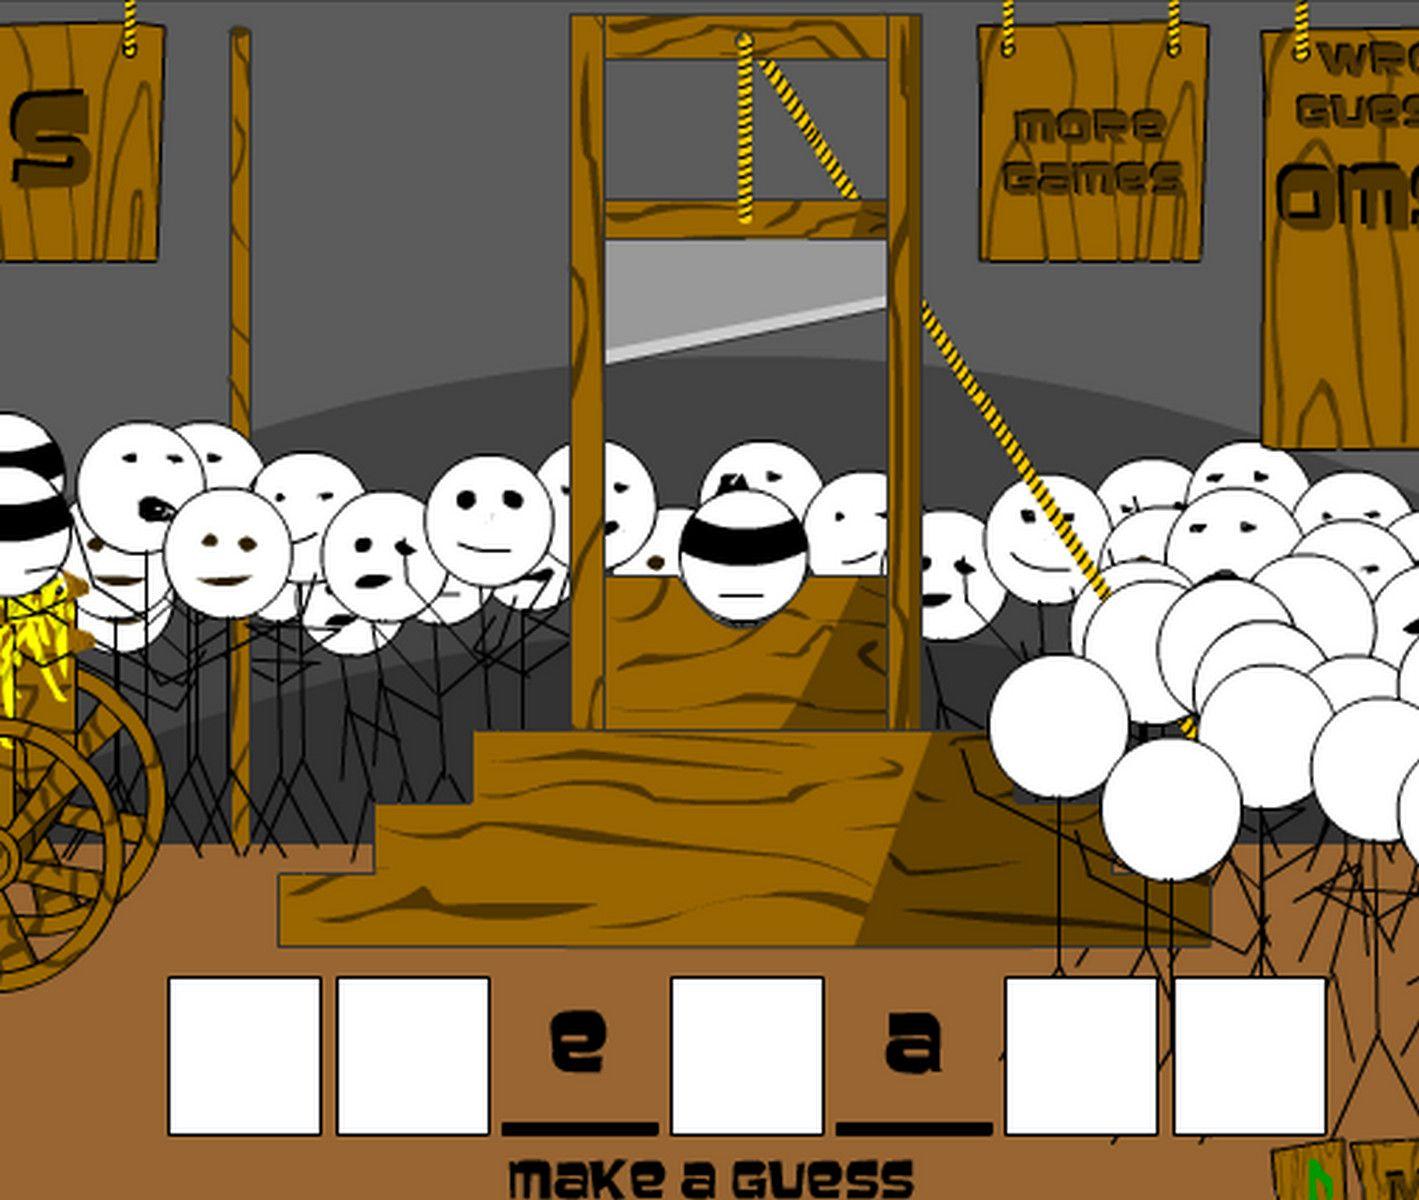 Games on Hangman game, Games, Fighting games